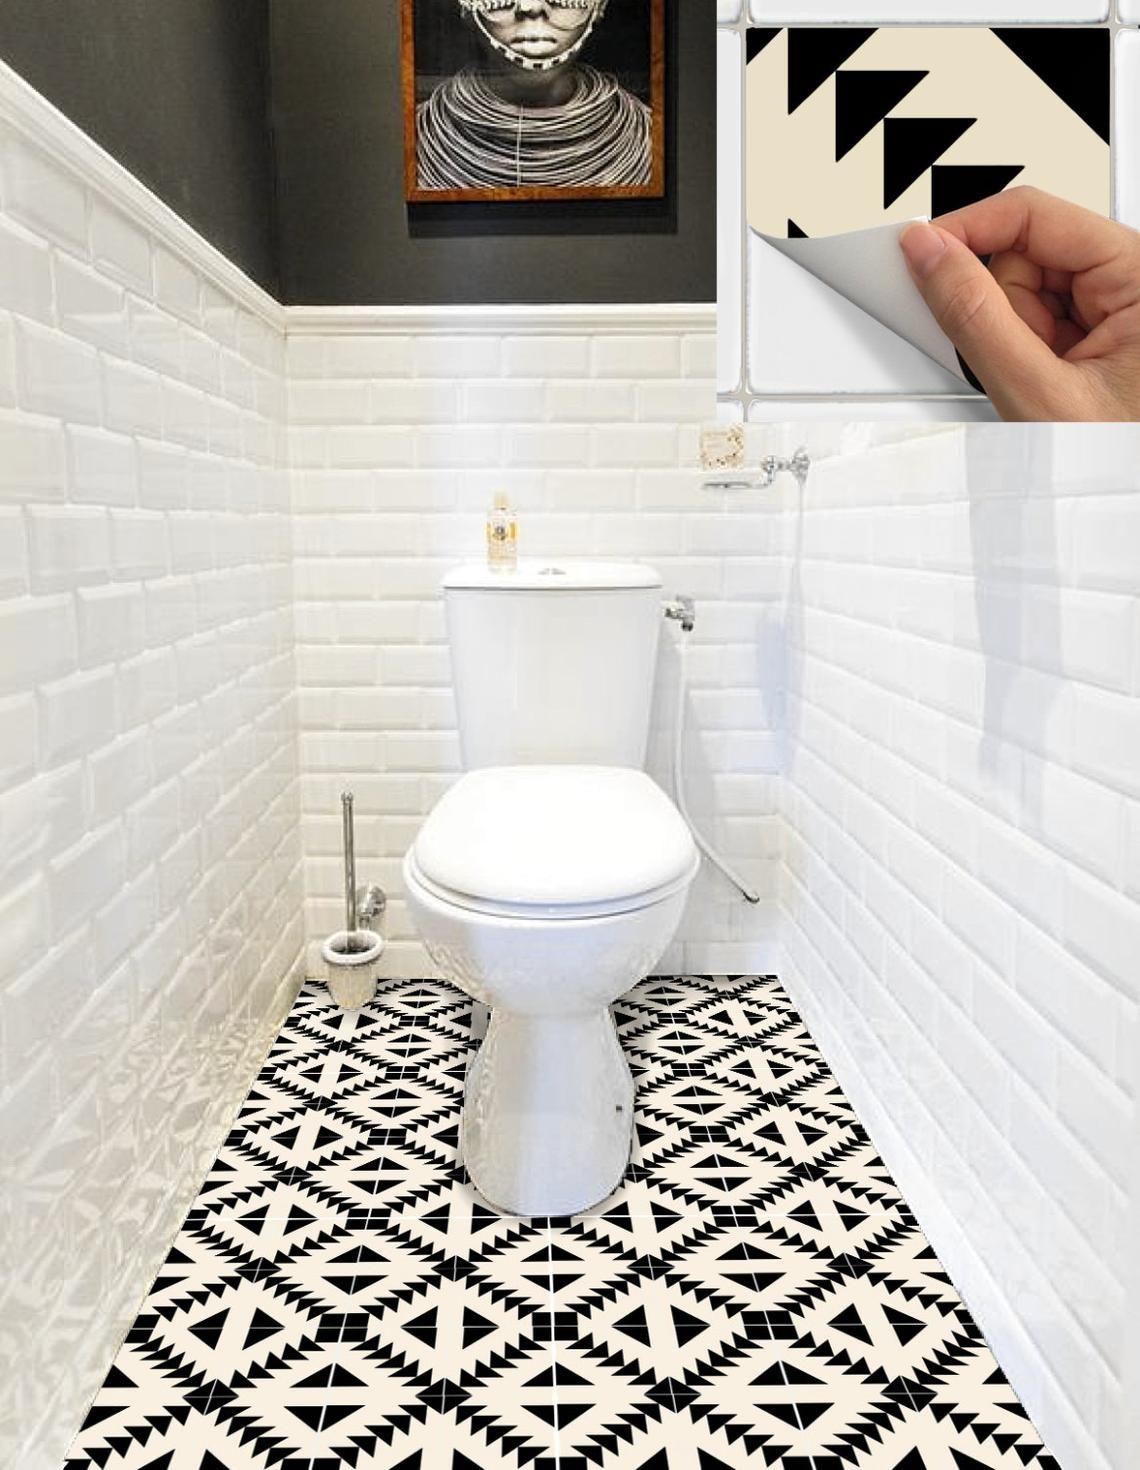 Tile Sticker Kitchen Bath Floor Wall Waterproof Removable Peel N Stick W010beige Poly Dlya Vannoj Sovremennyj Tualet Vannaya V Kvartire